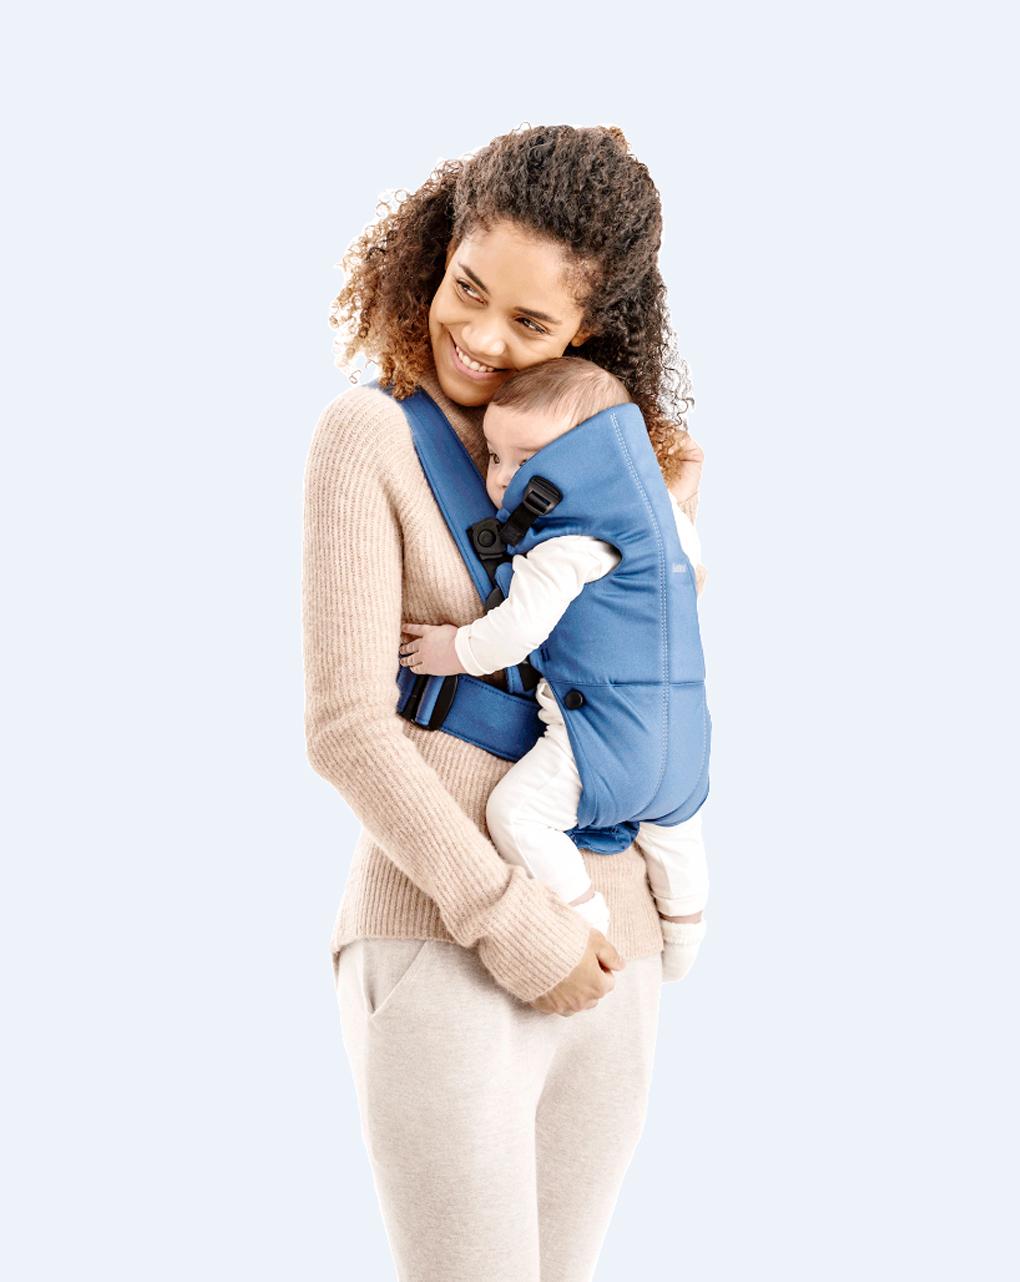 Marsupio baby carrier mini vintage indigo cotton - Baby Bjorn